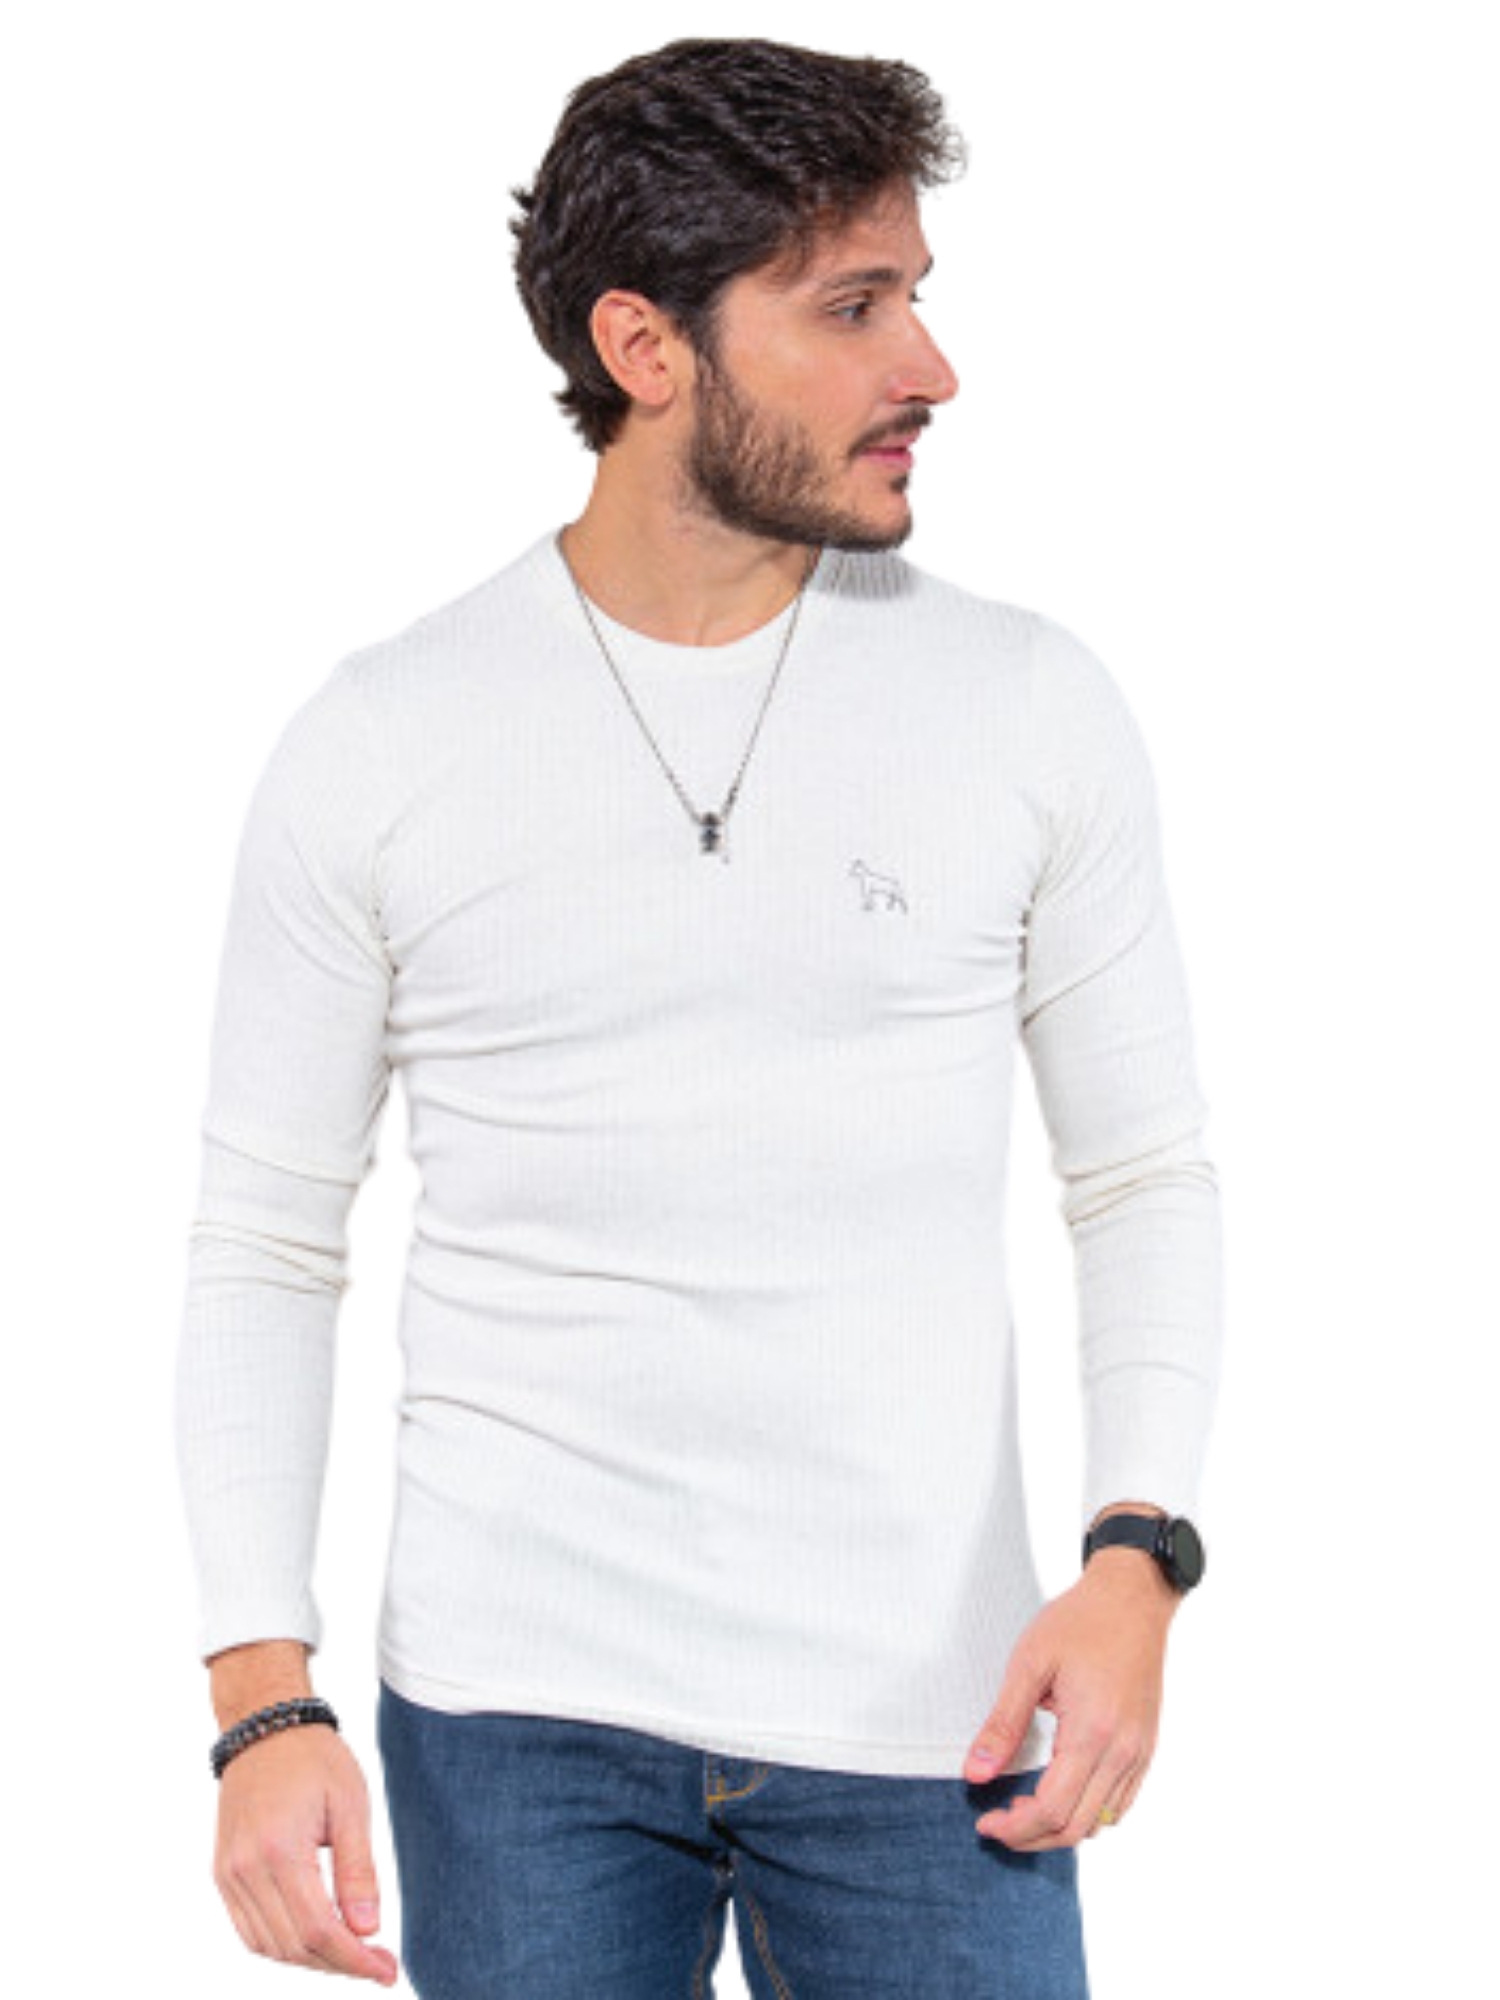 Camiseta Canelada Manga Longa Revanche  113392